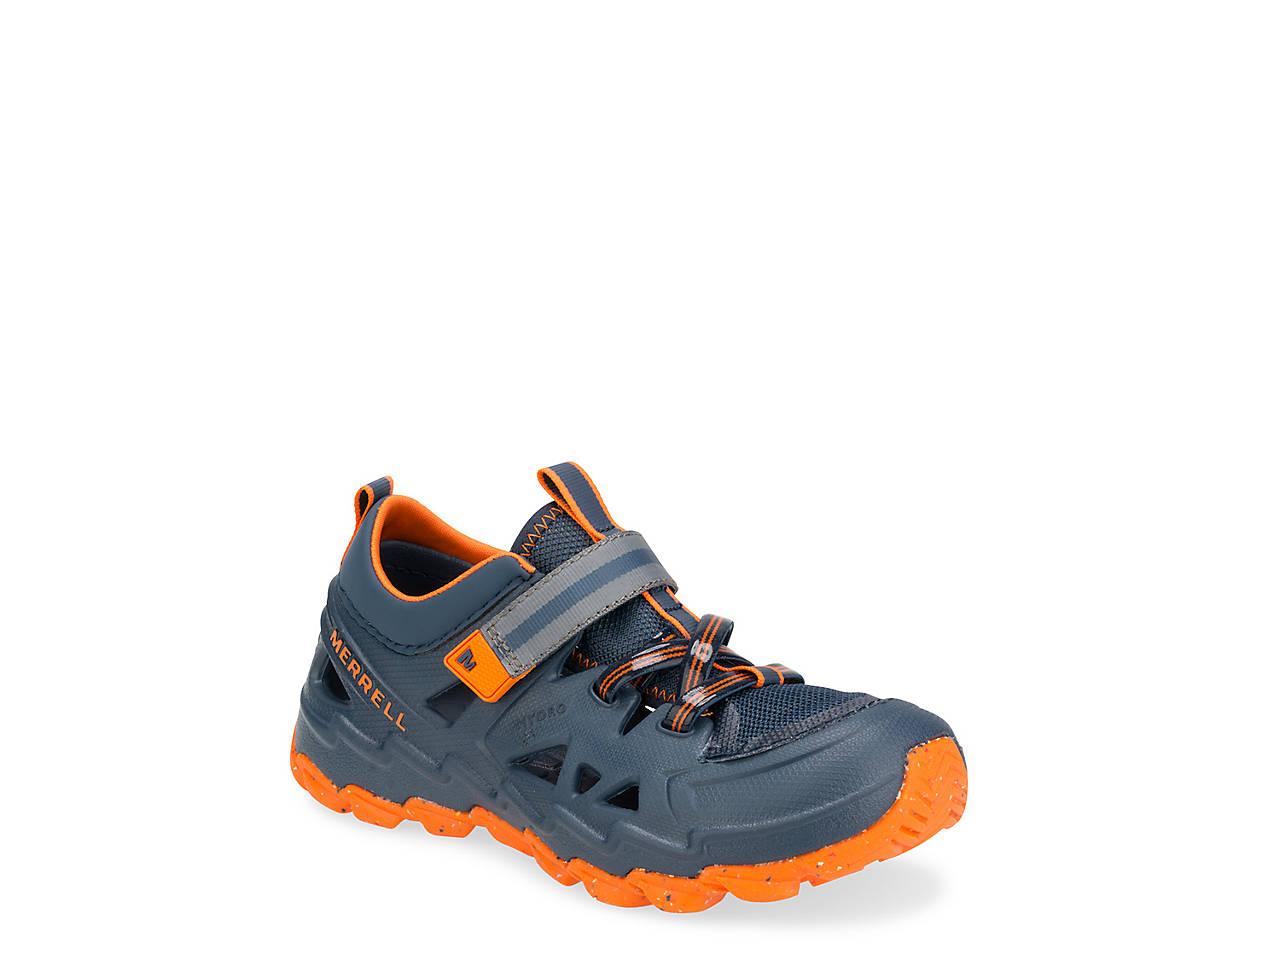 c448c7f298 Hydro 2.0 Trail Shoe - Kids'